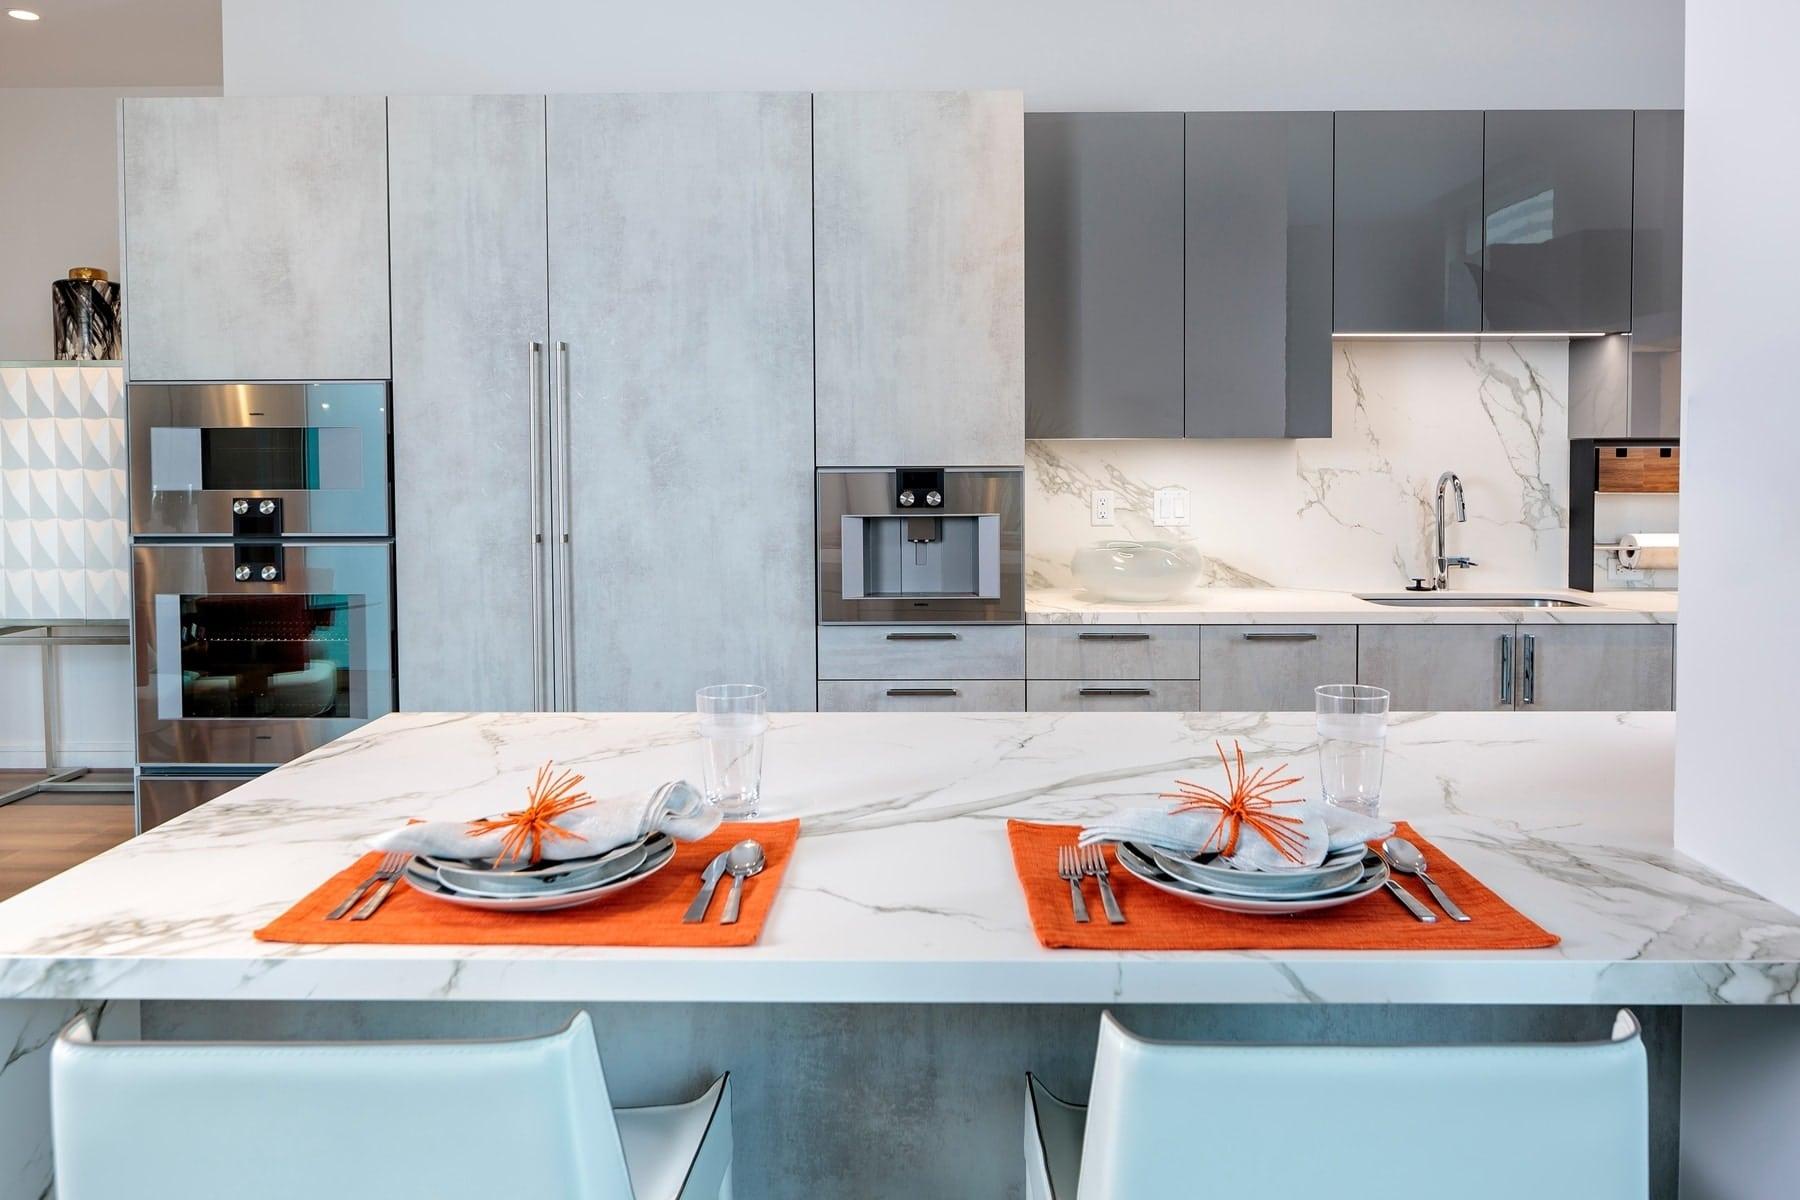 eat in kitchen by eggersmann in the model unit of arabella luxury condos in houston